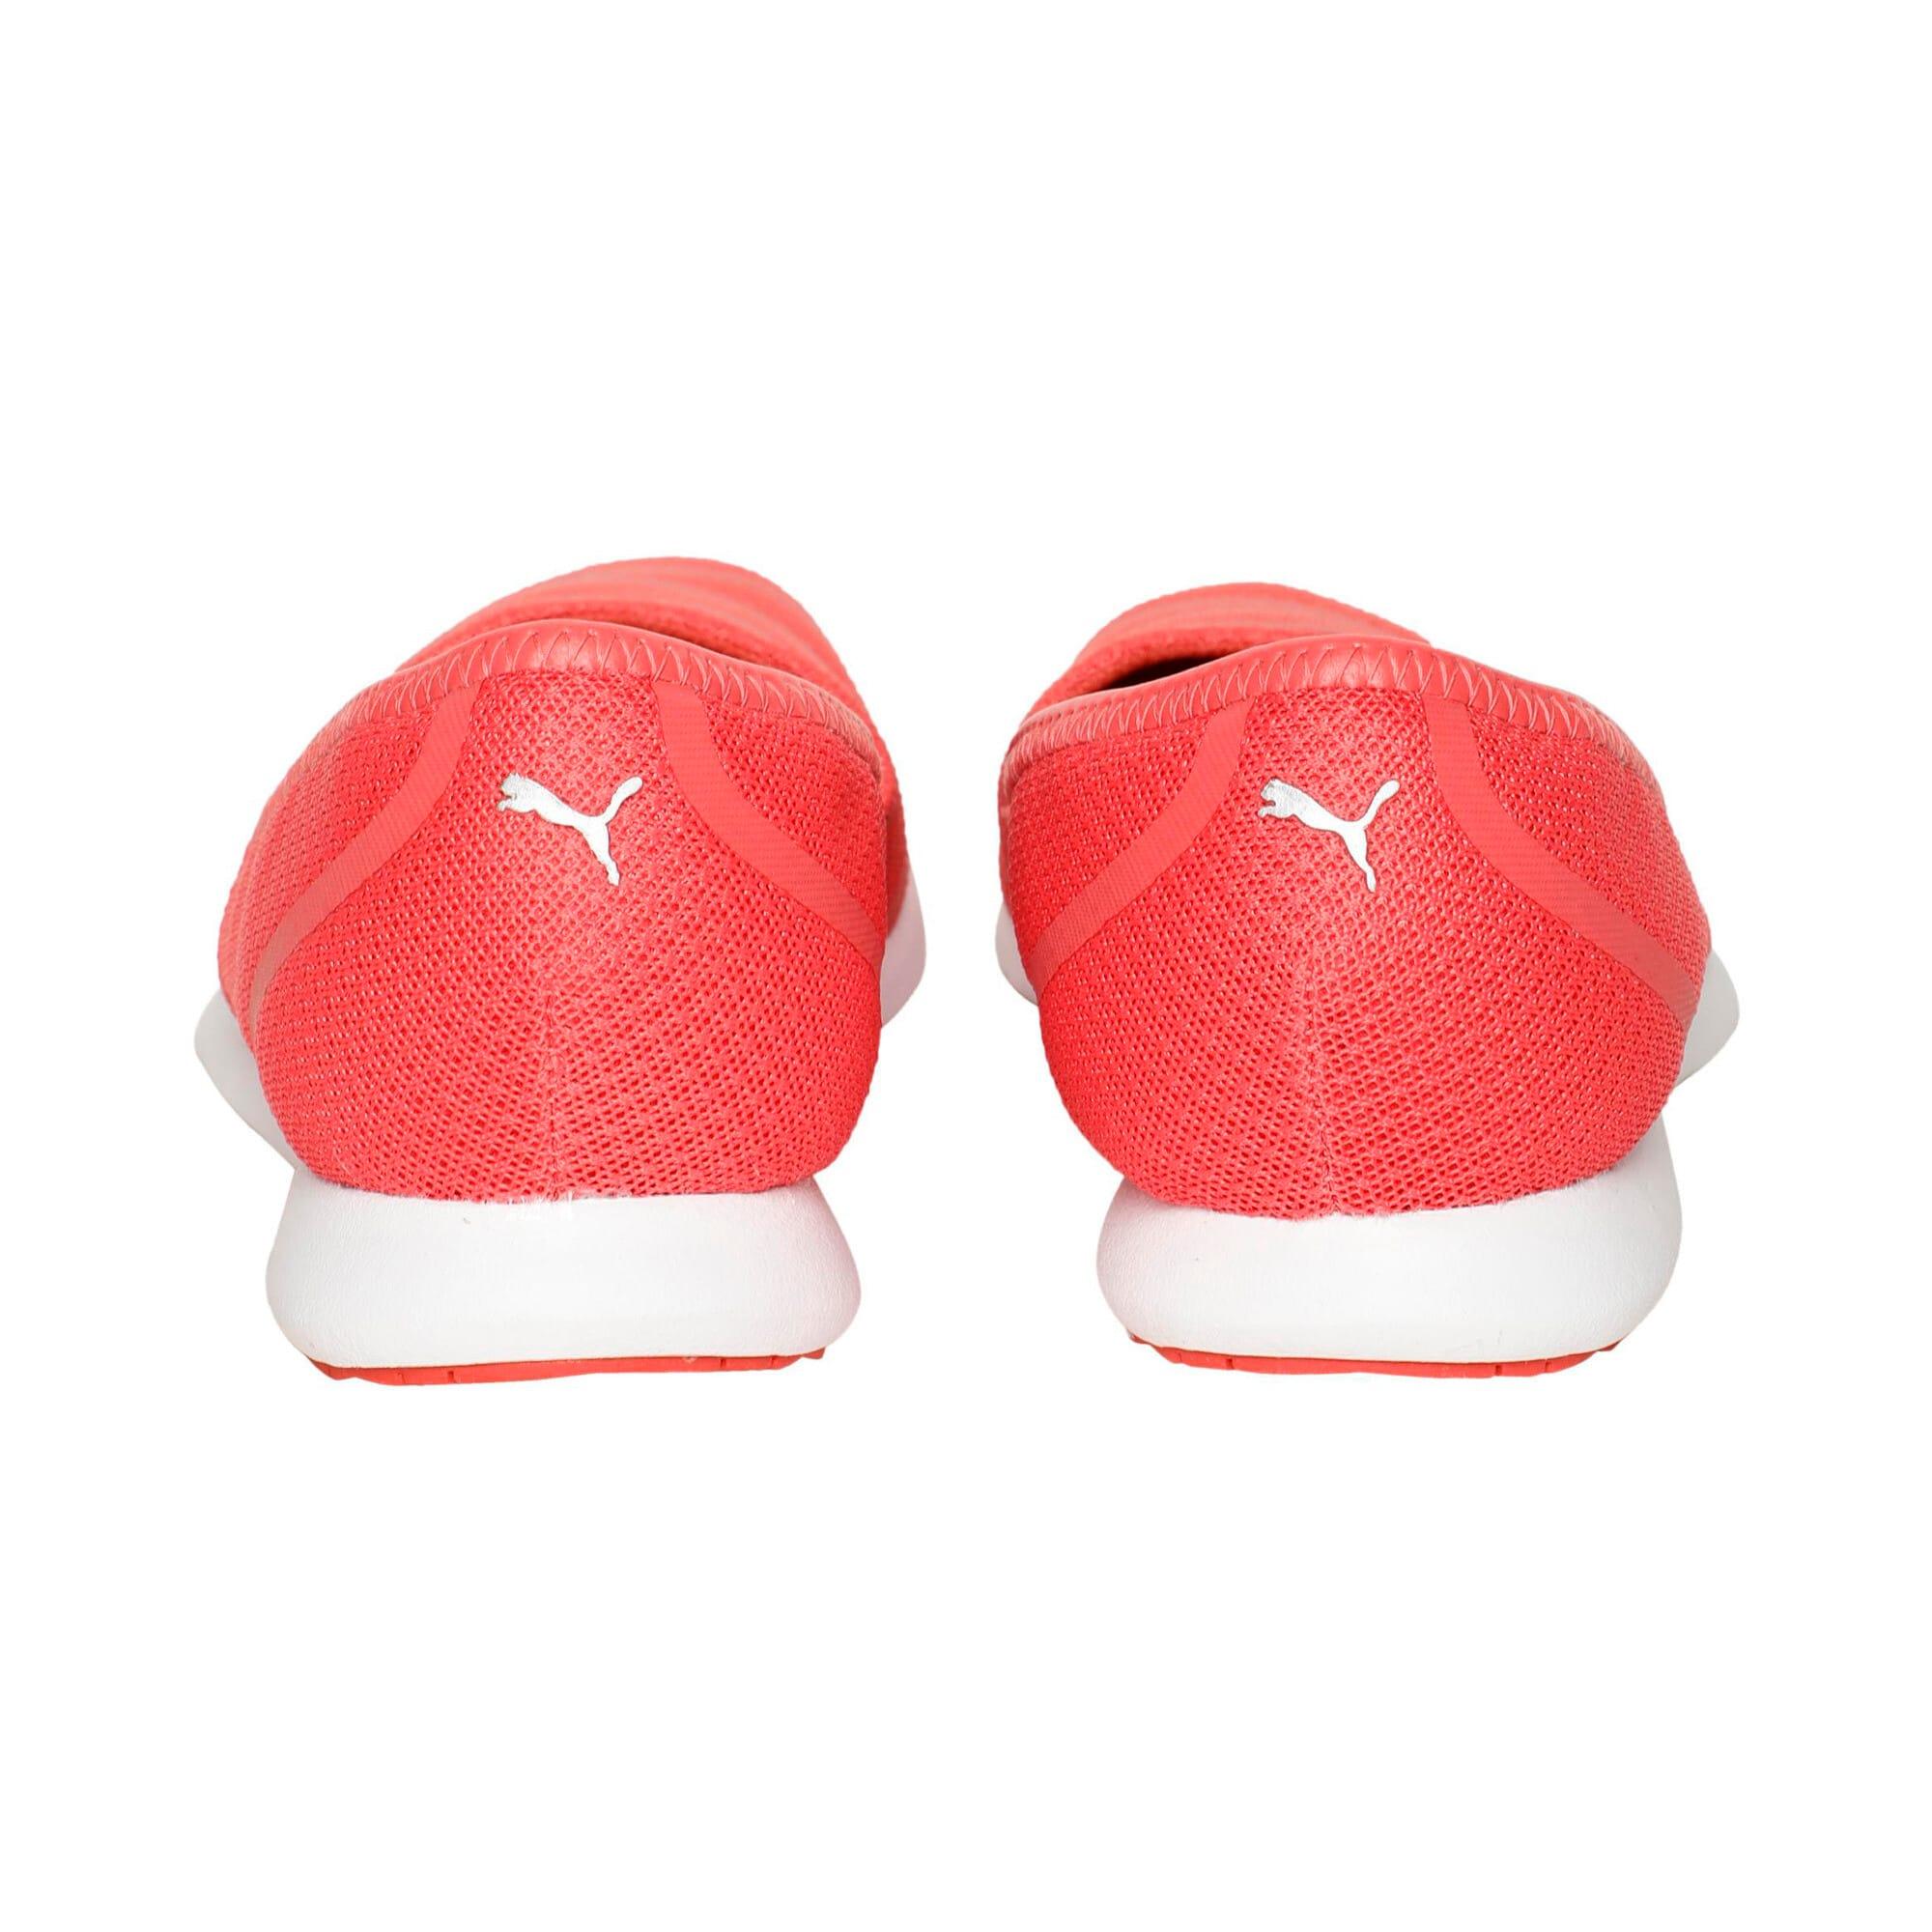 Thumbnail 3 of Escaper SL Jr Running Shoes, Puma Black-Puma White, medium-IND